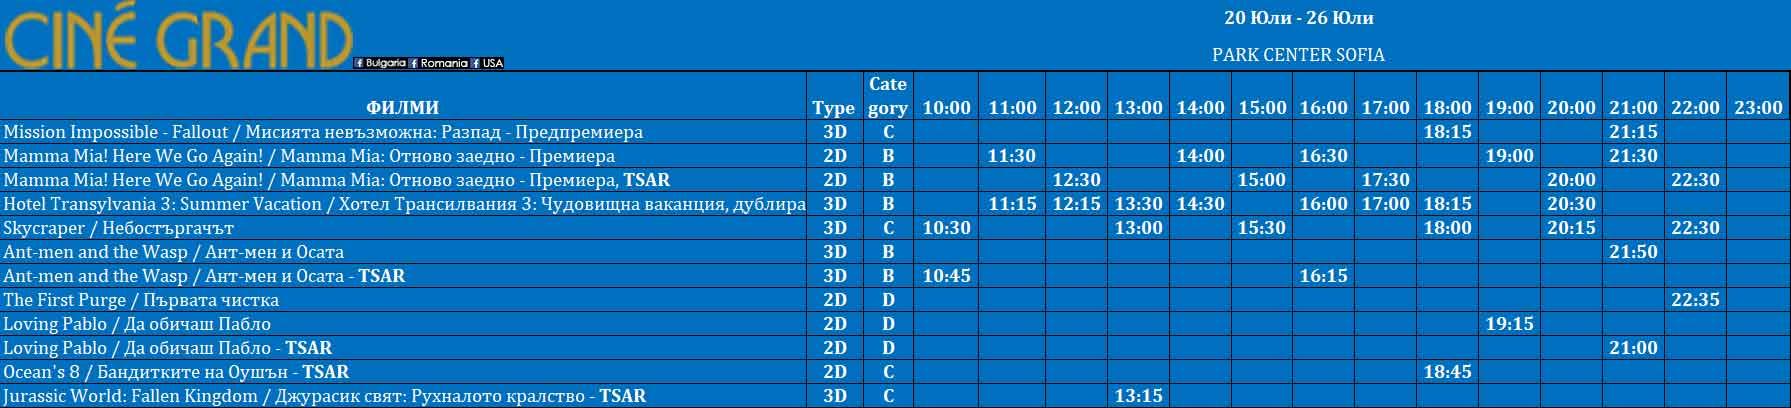 Програма за кината на Cine Grand - Park Center Sofia за периода 20 юли – 27 юли 2018г.